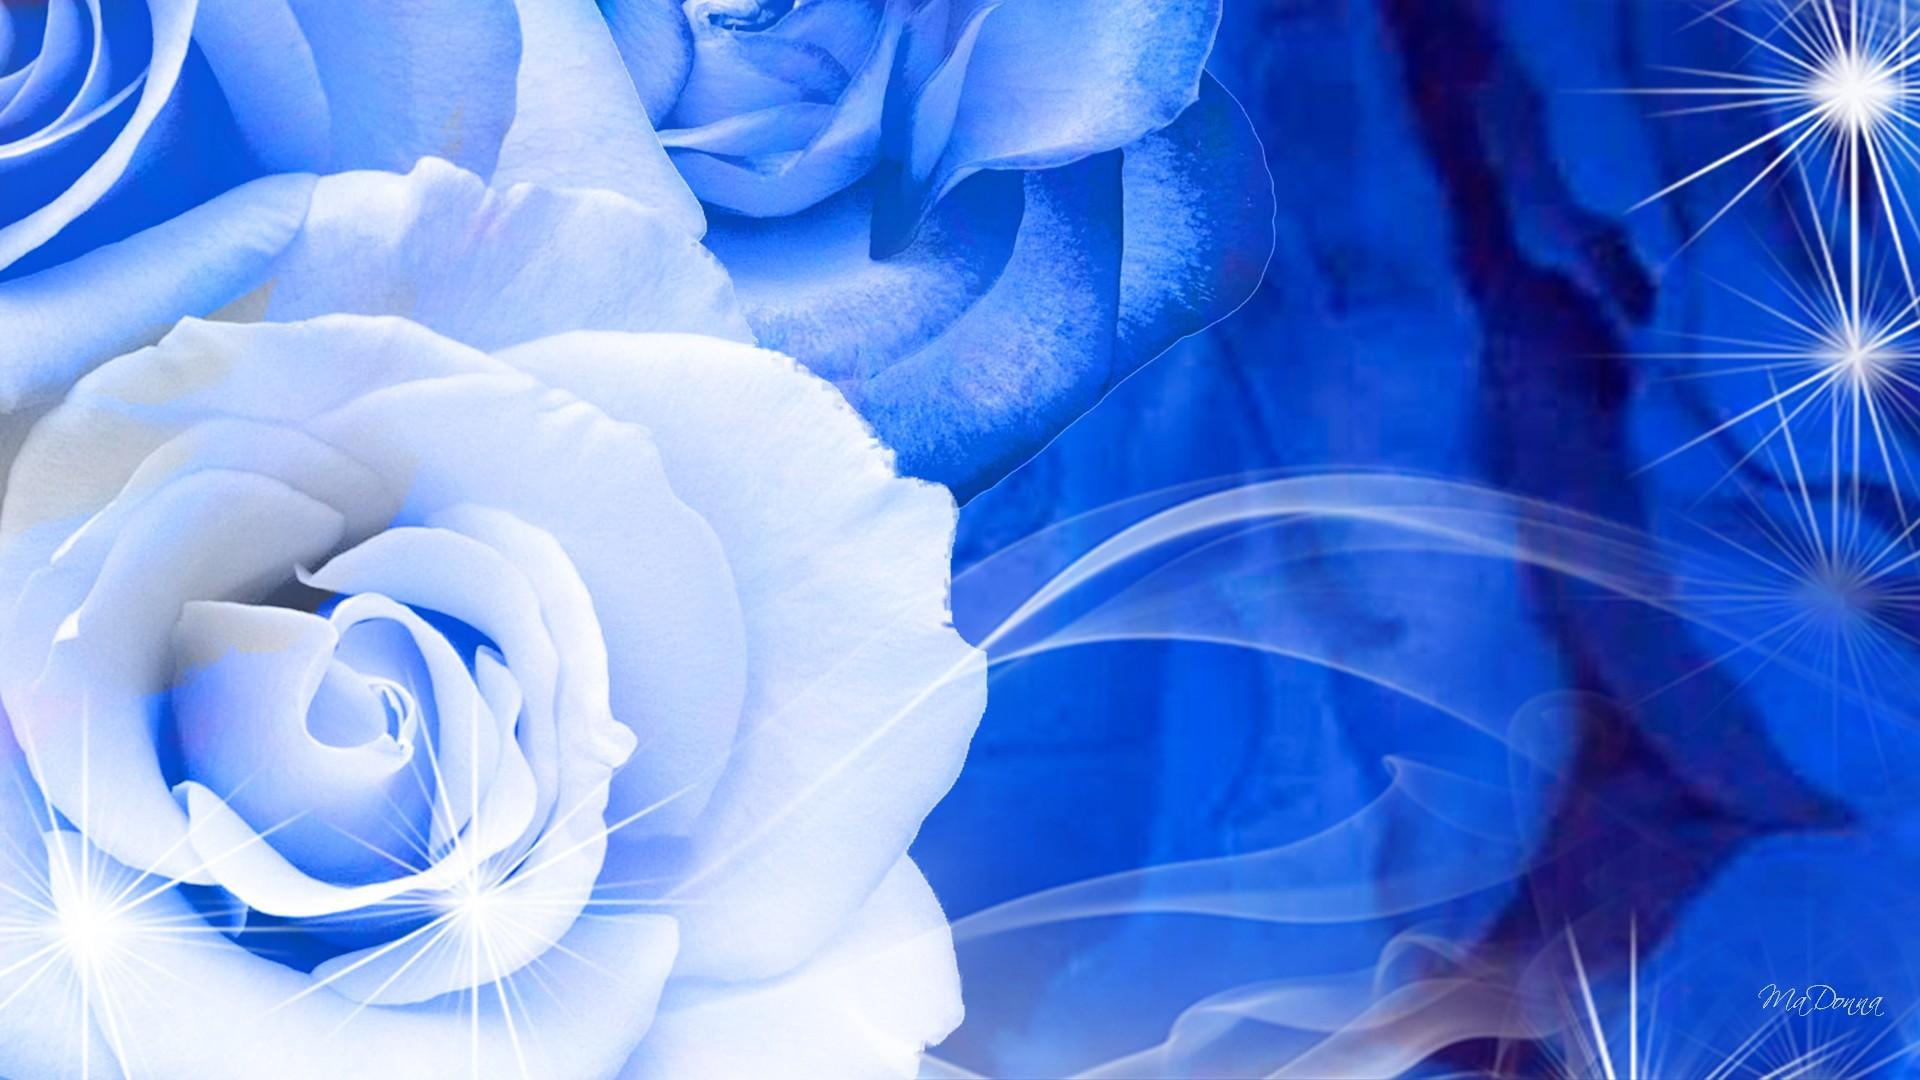 blue-and-white-rose-wallpaper-6-hd-wallpaper.jpg (1920×1080) | blue flowers  | Pinterest | Wallpaper, Flower wallpaper and Hd desktop